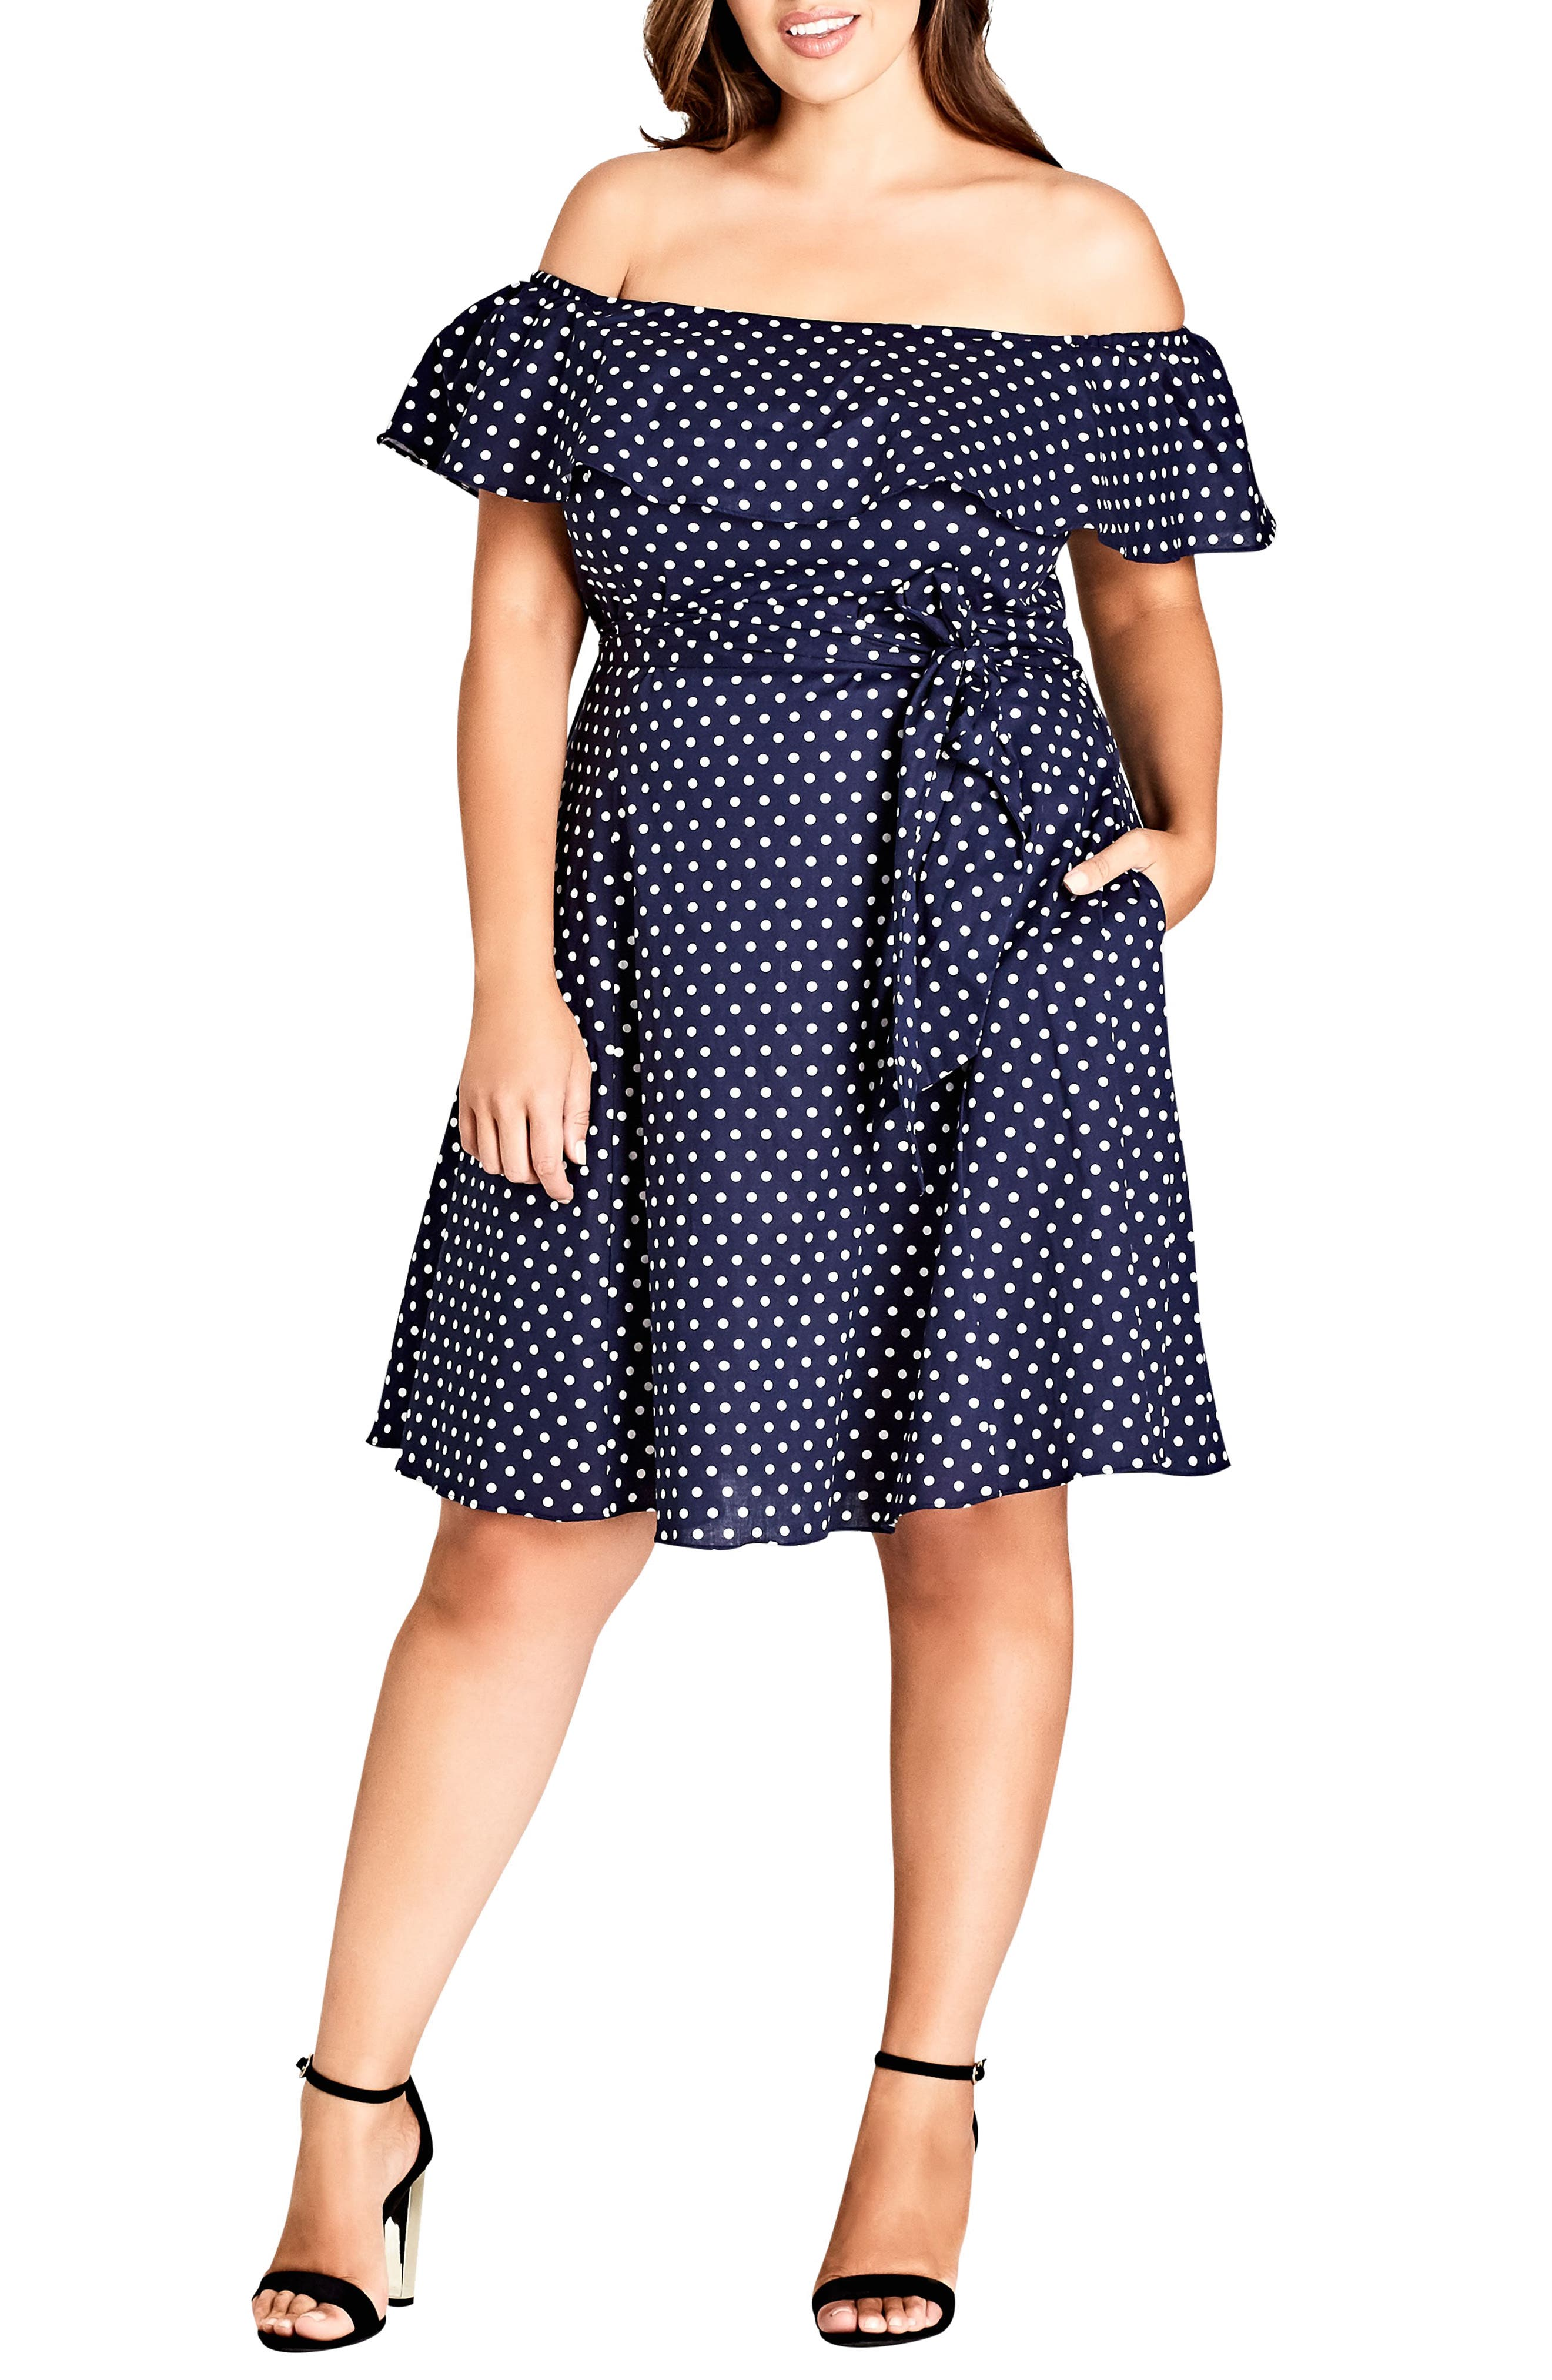 Sweet Off the Shoulder Fit & Flare Dress,                         Main,                         color, Spot